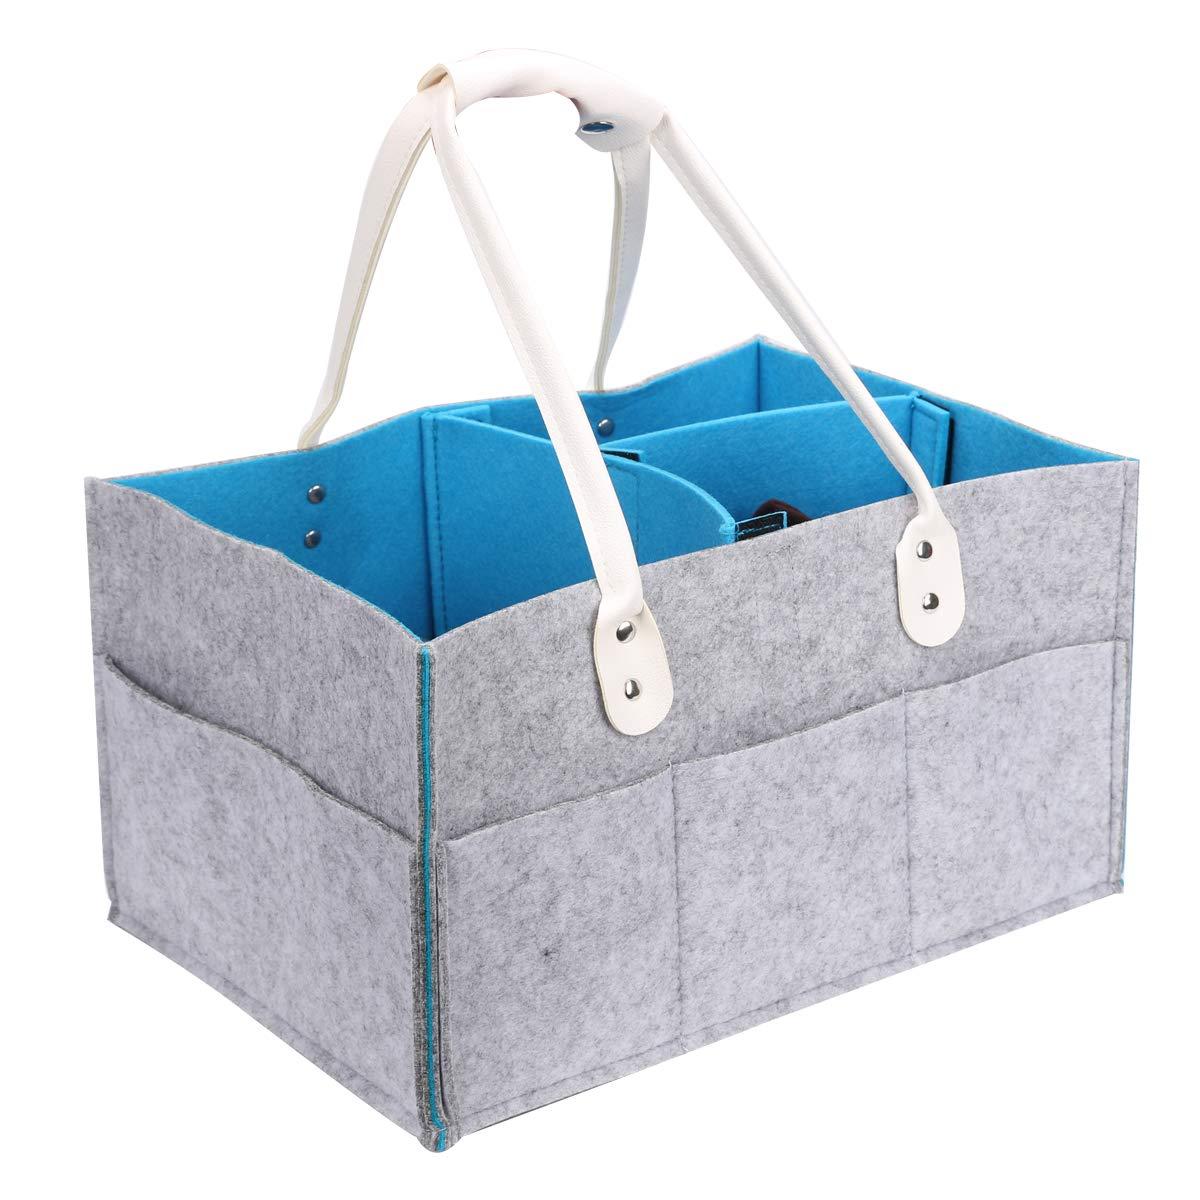 SbuyCoo Baby Diaper Caddy Organizer, Nursery Diaper Storage Bin, Wipes, and Toys, Newborn Registry Must Have, Large Portable Bin for Nursery Room